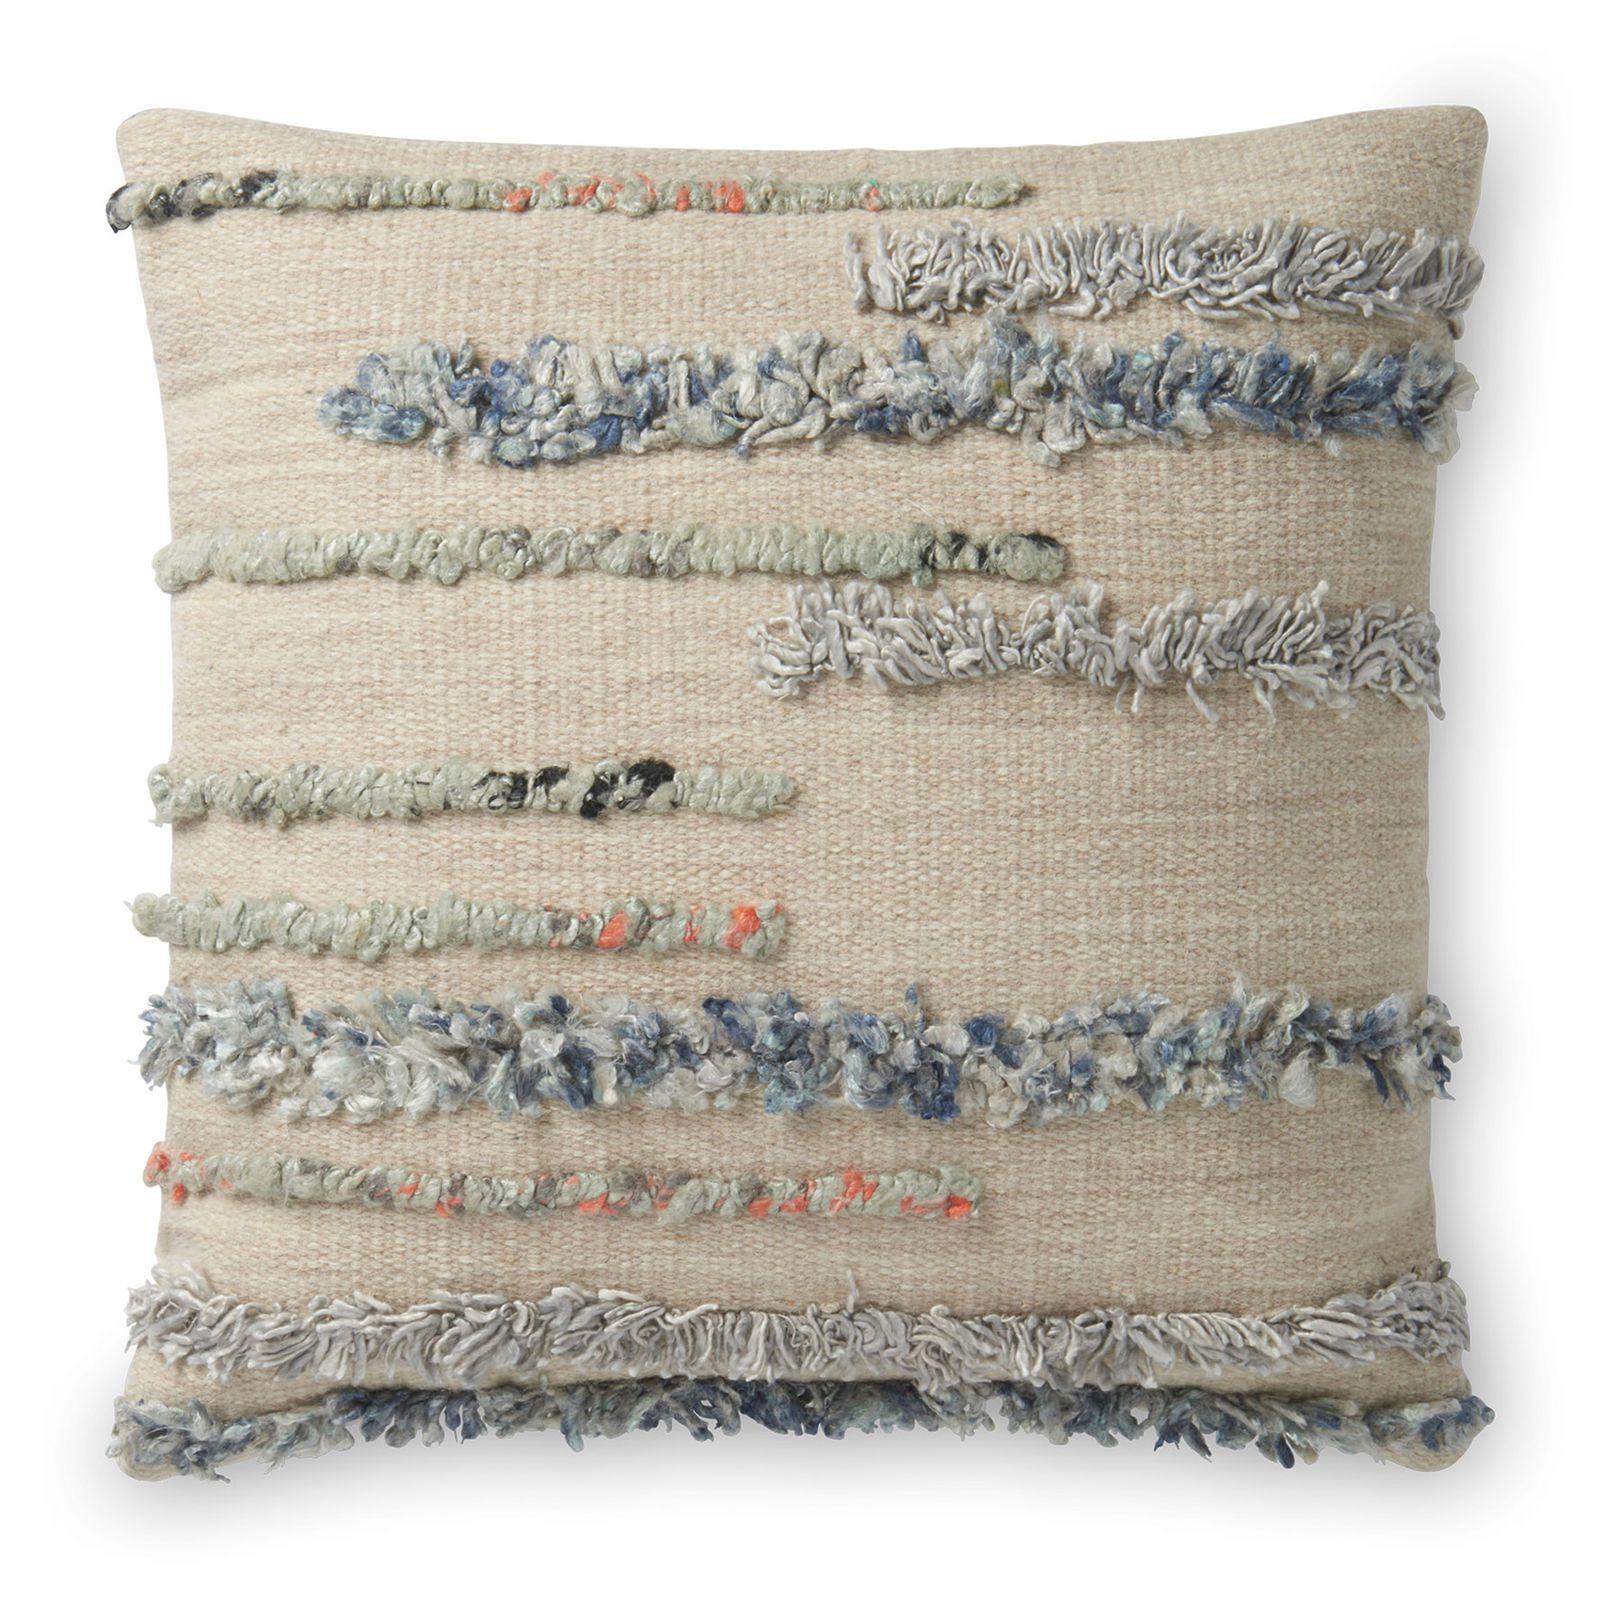 Cynthia Rowley Fringe Pillows: Magnolia Home Harper Pillow